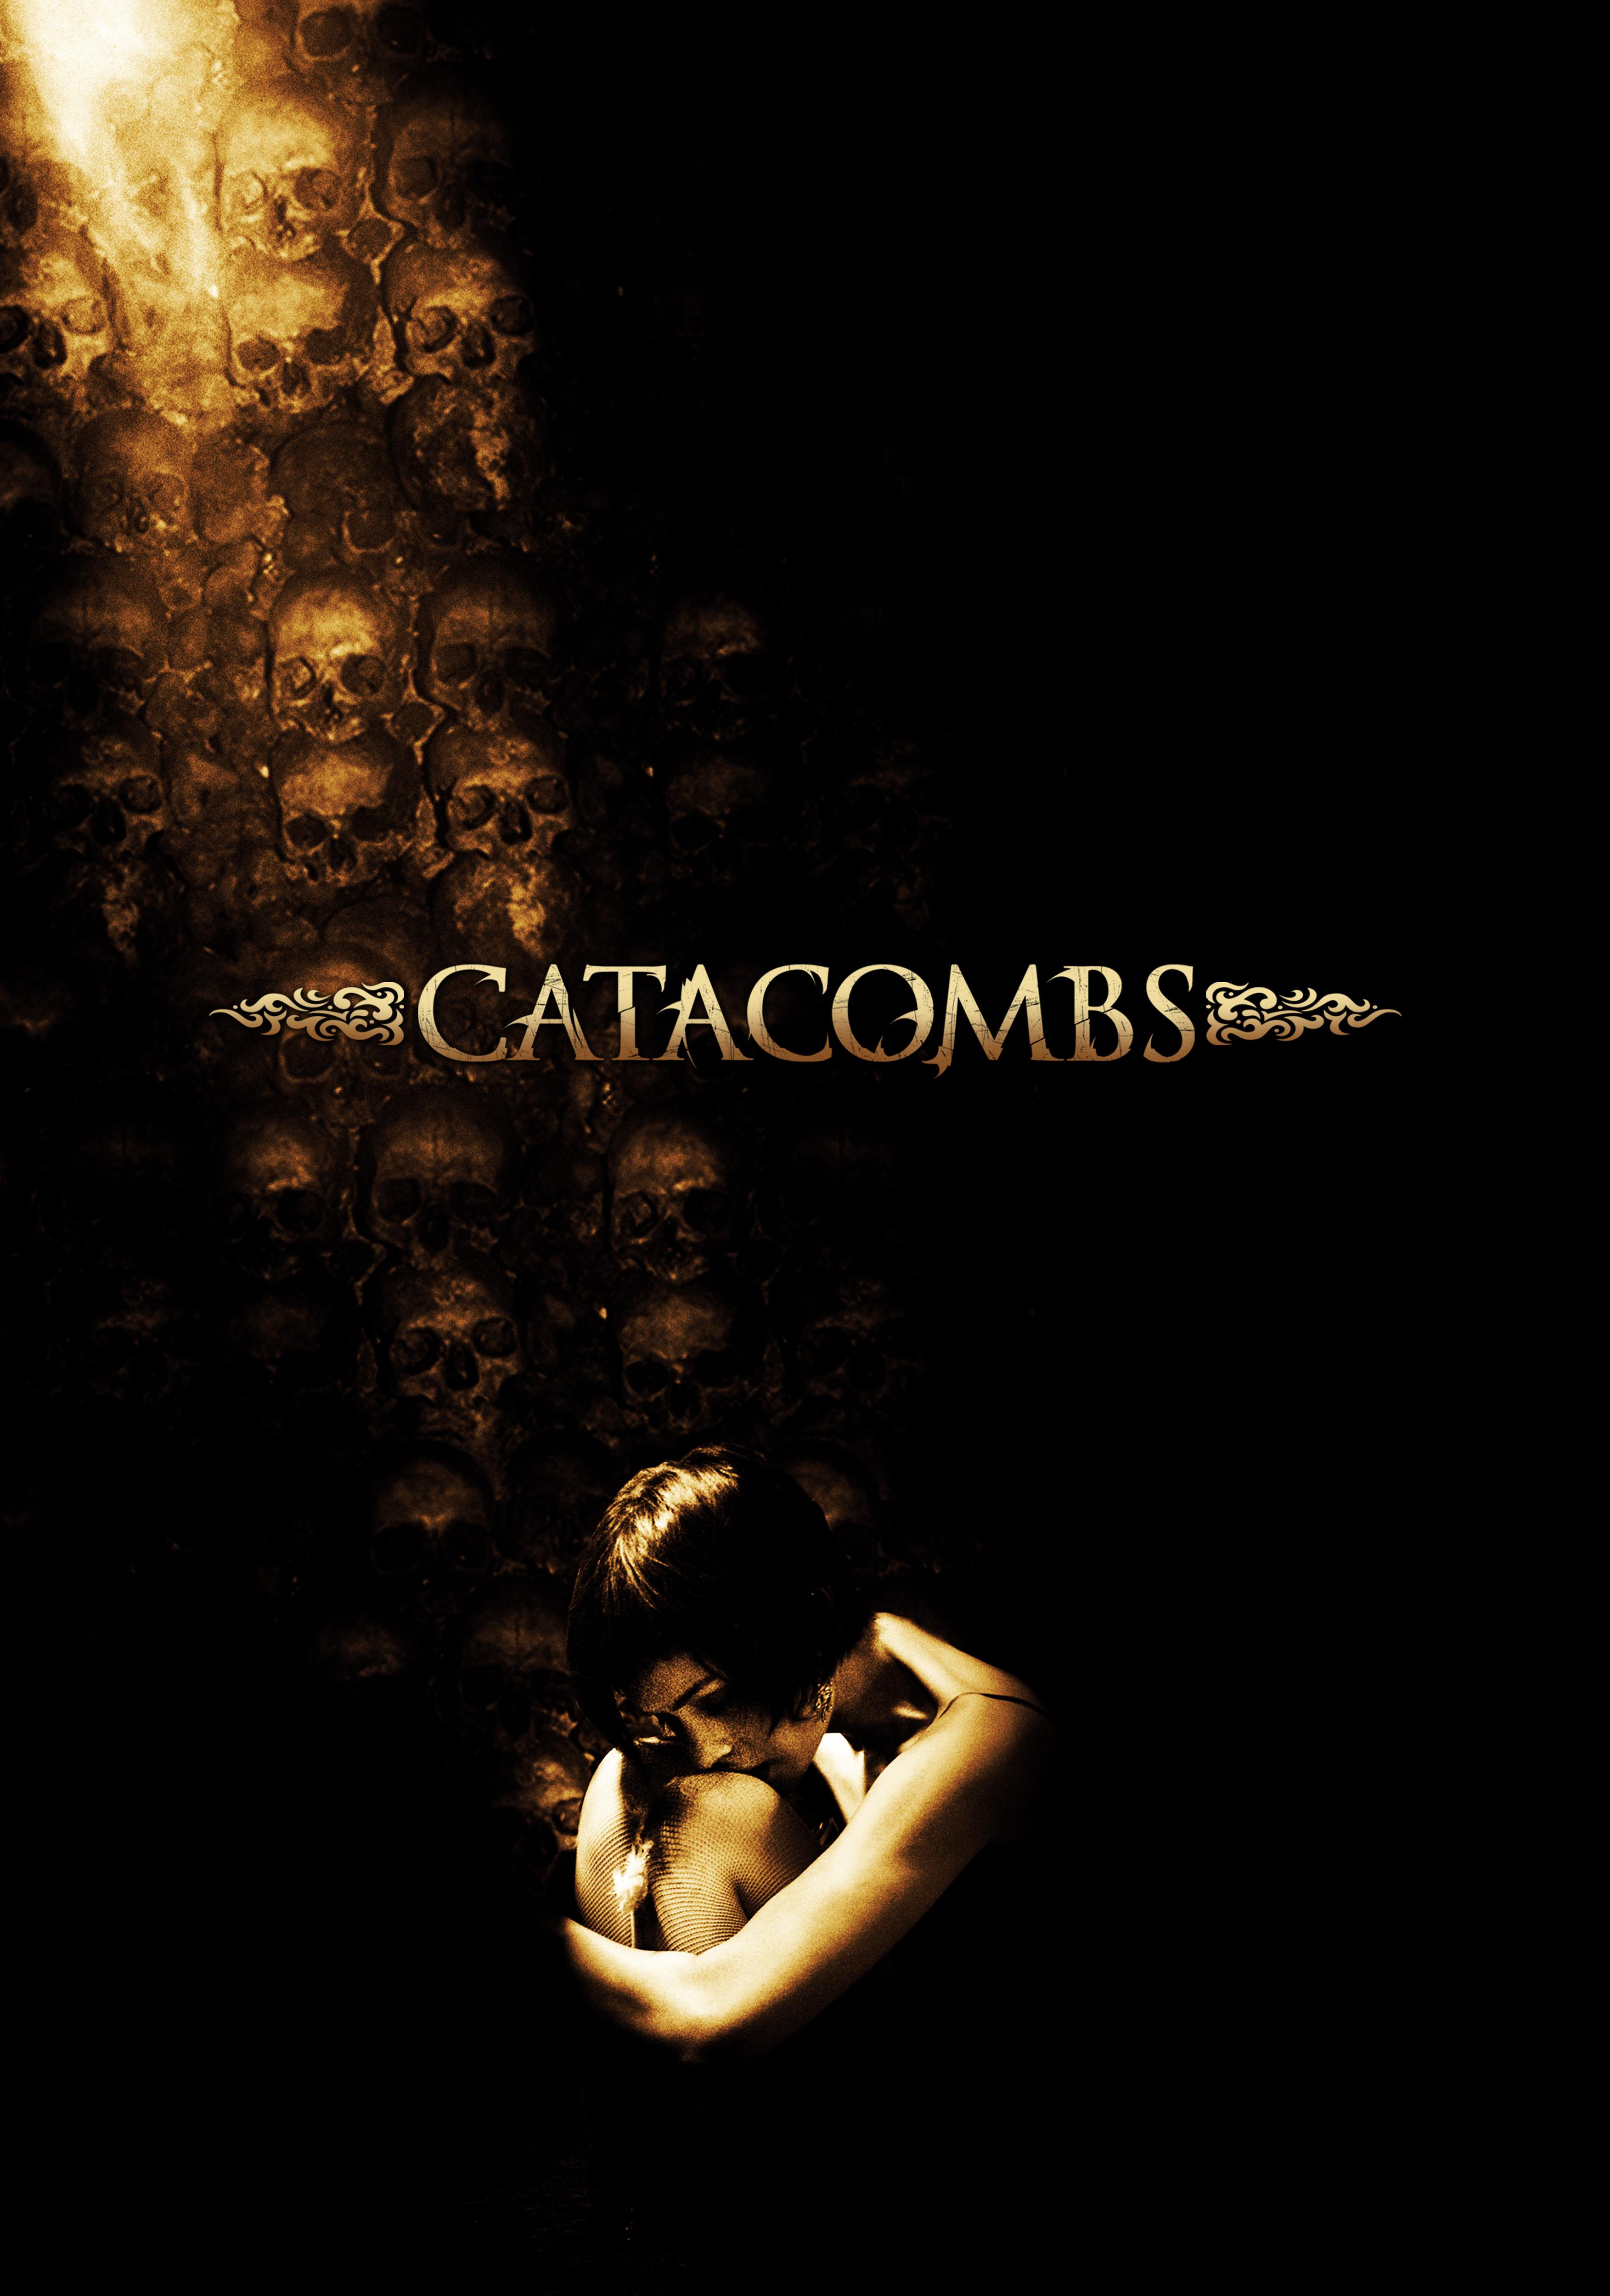 Catacombs (2007) - IMDb